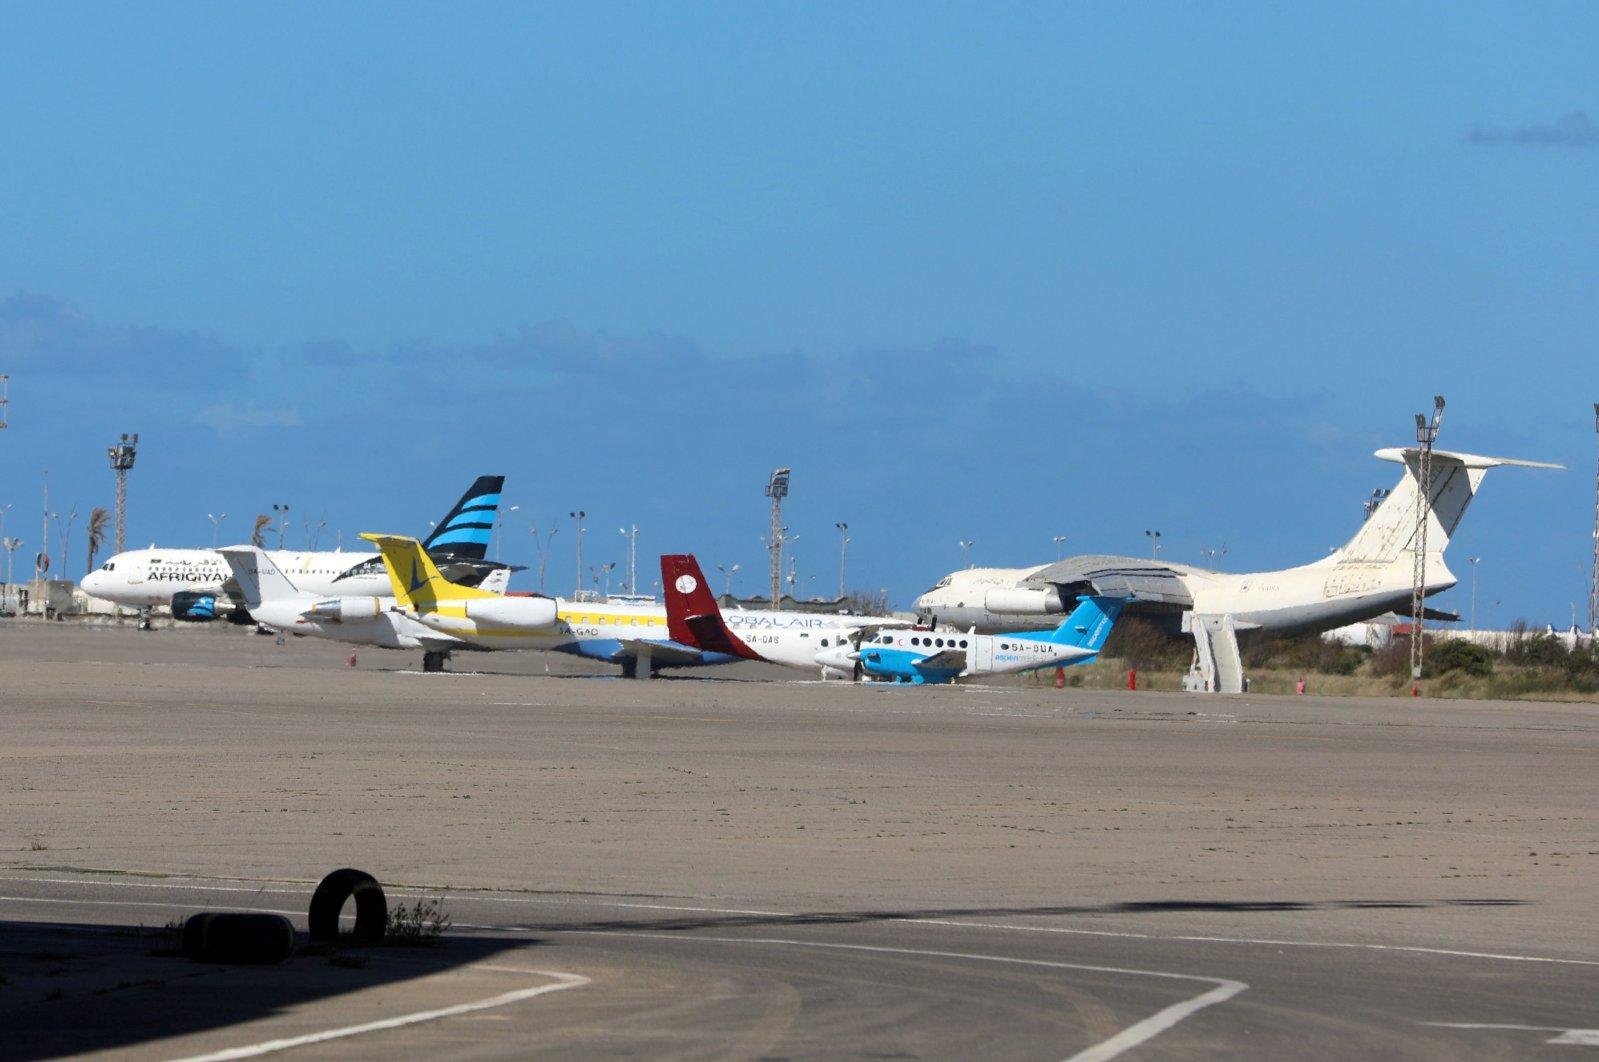 Airplanes are seen at Mitiga airport in Tripoli, Libya, April 8, 2019. (Reuters Photo)